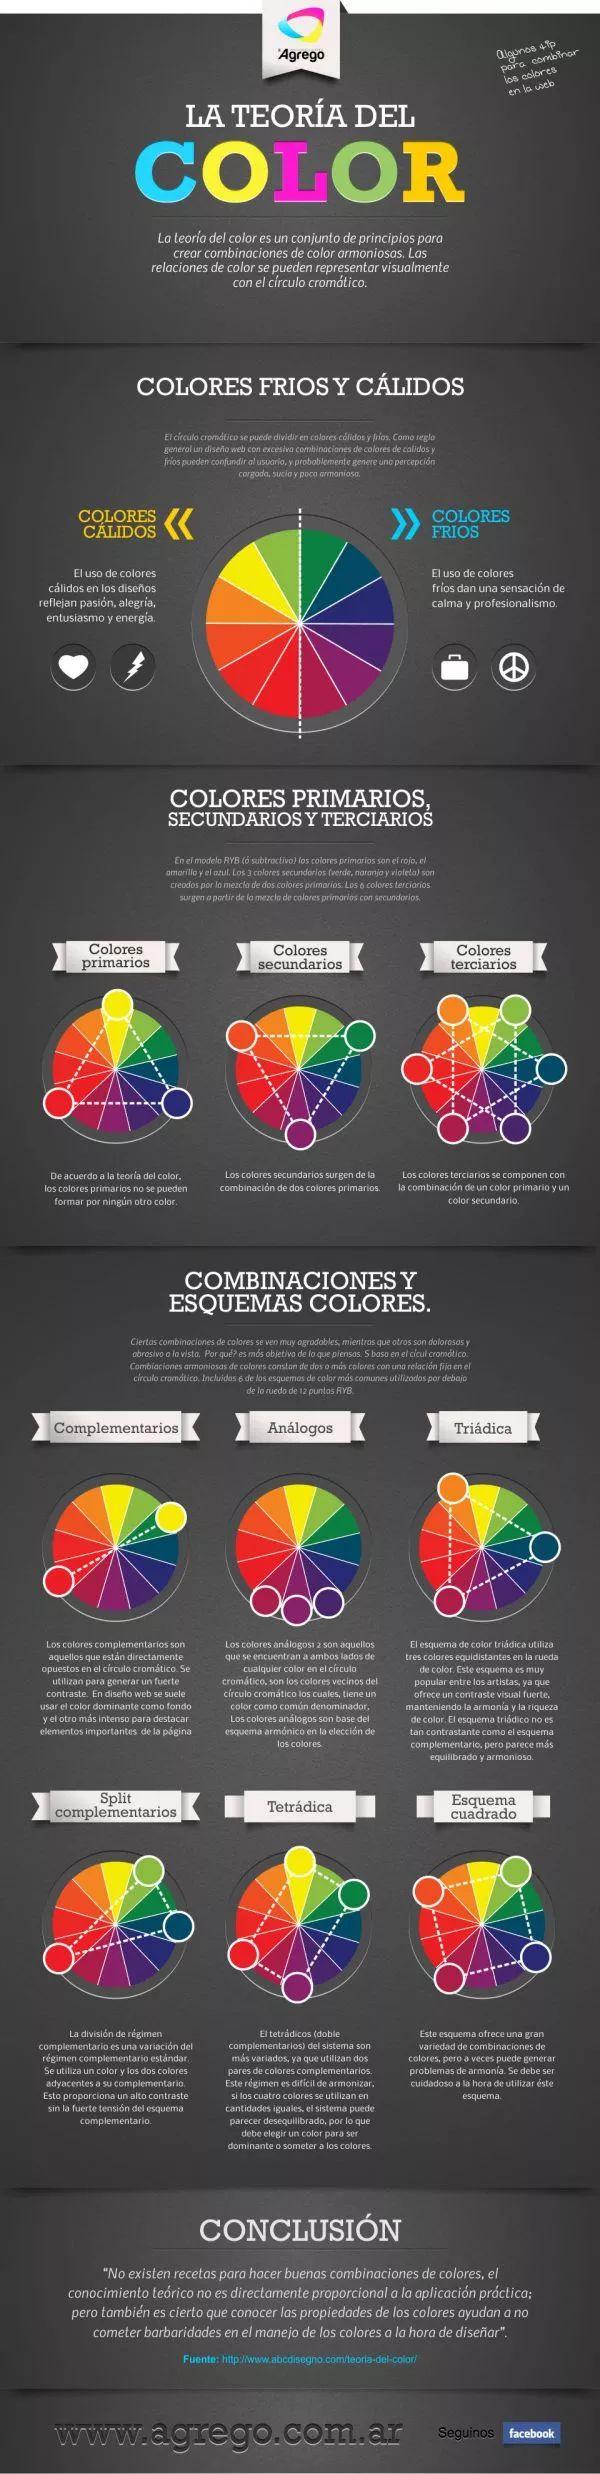 la-teoria-del-color